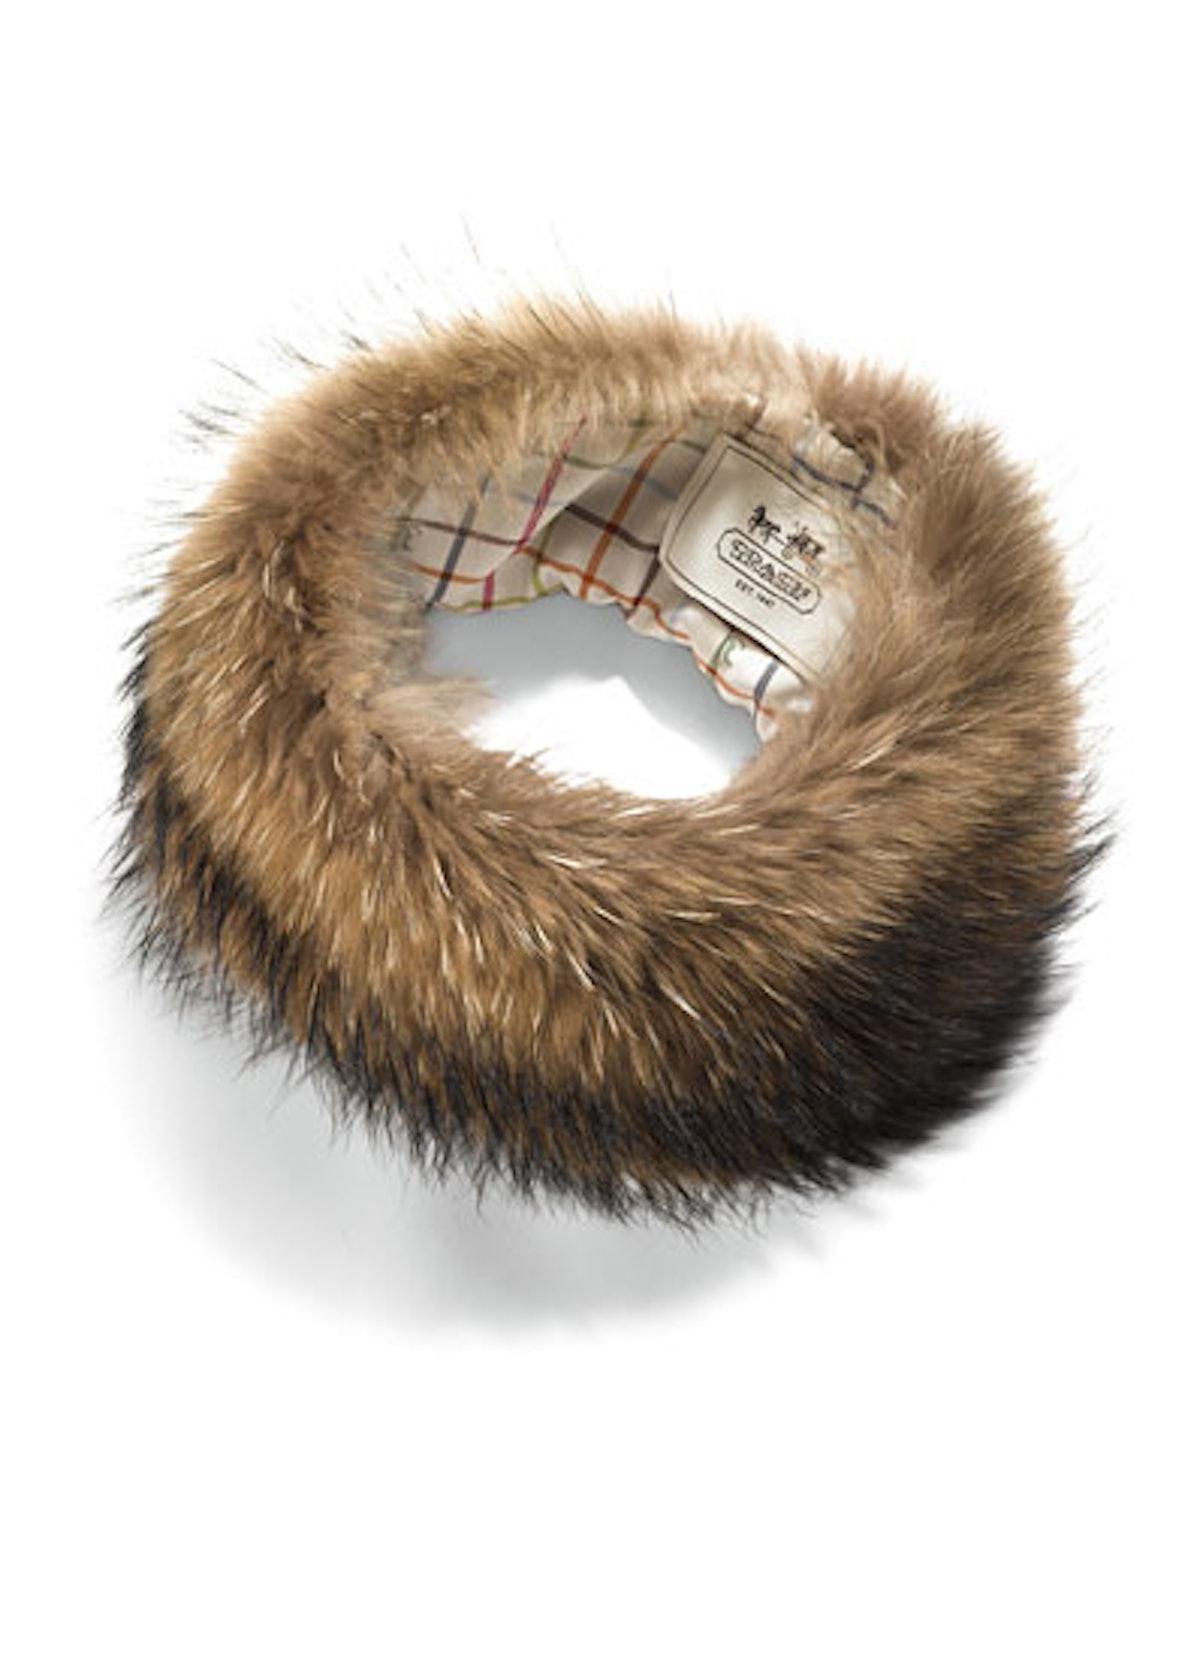 acss-winter-accessories-05-v.jpg